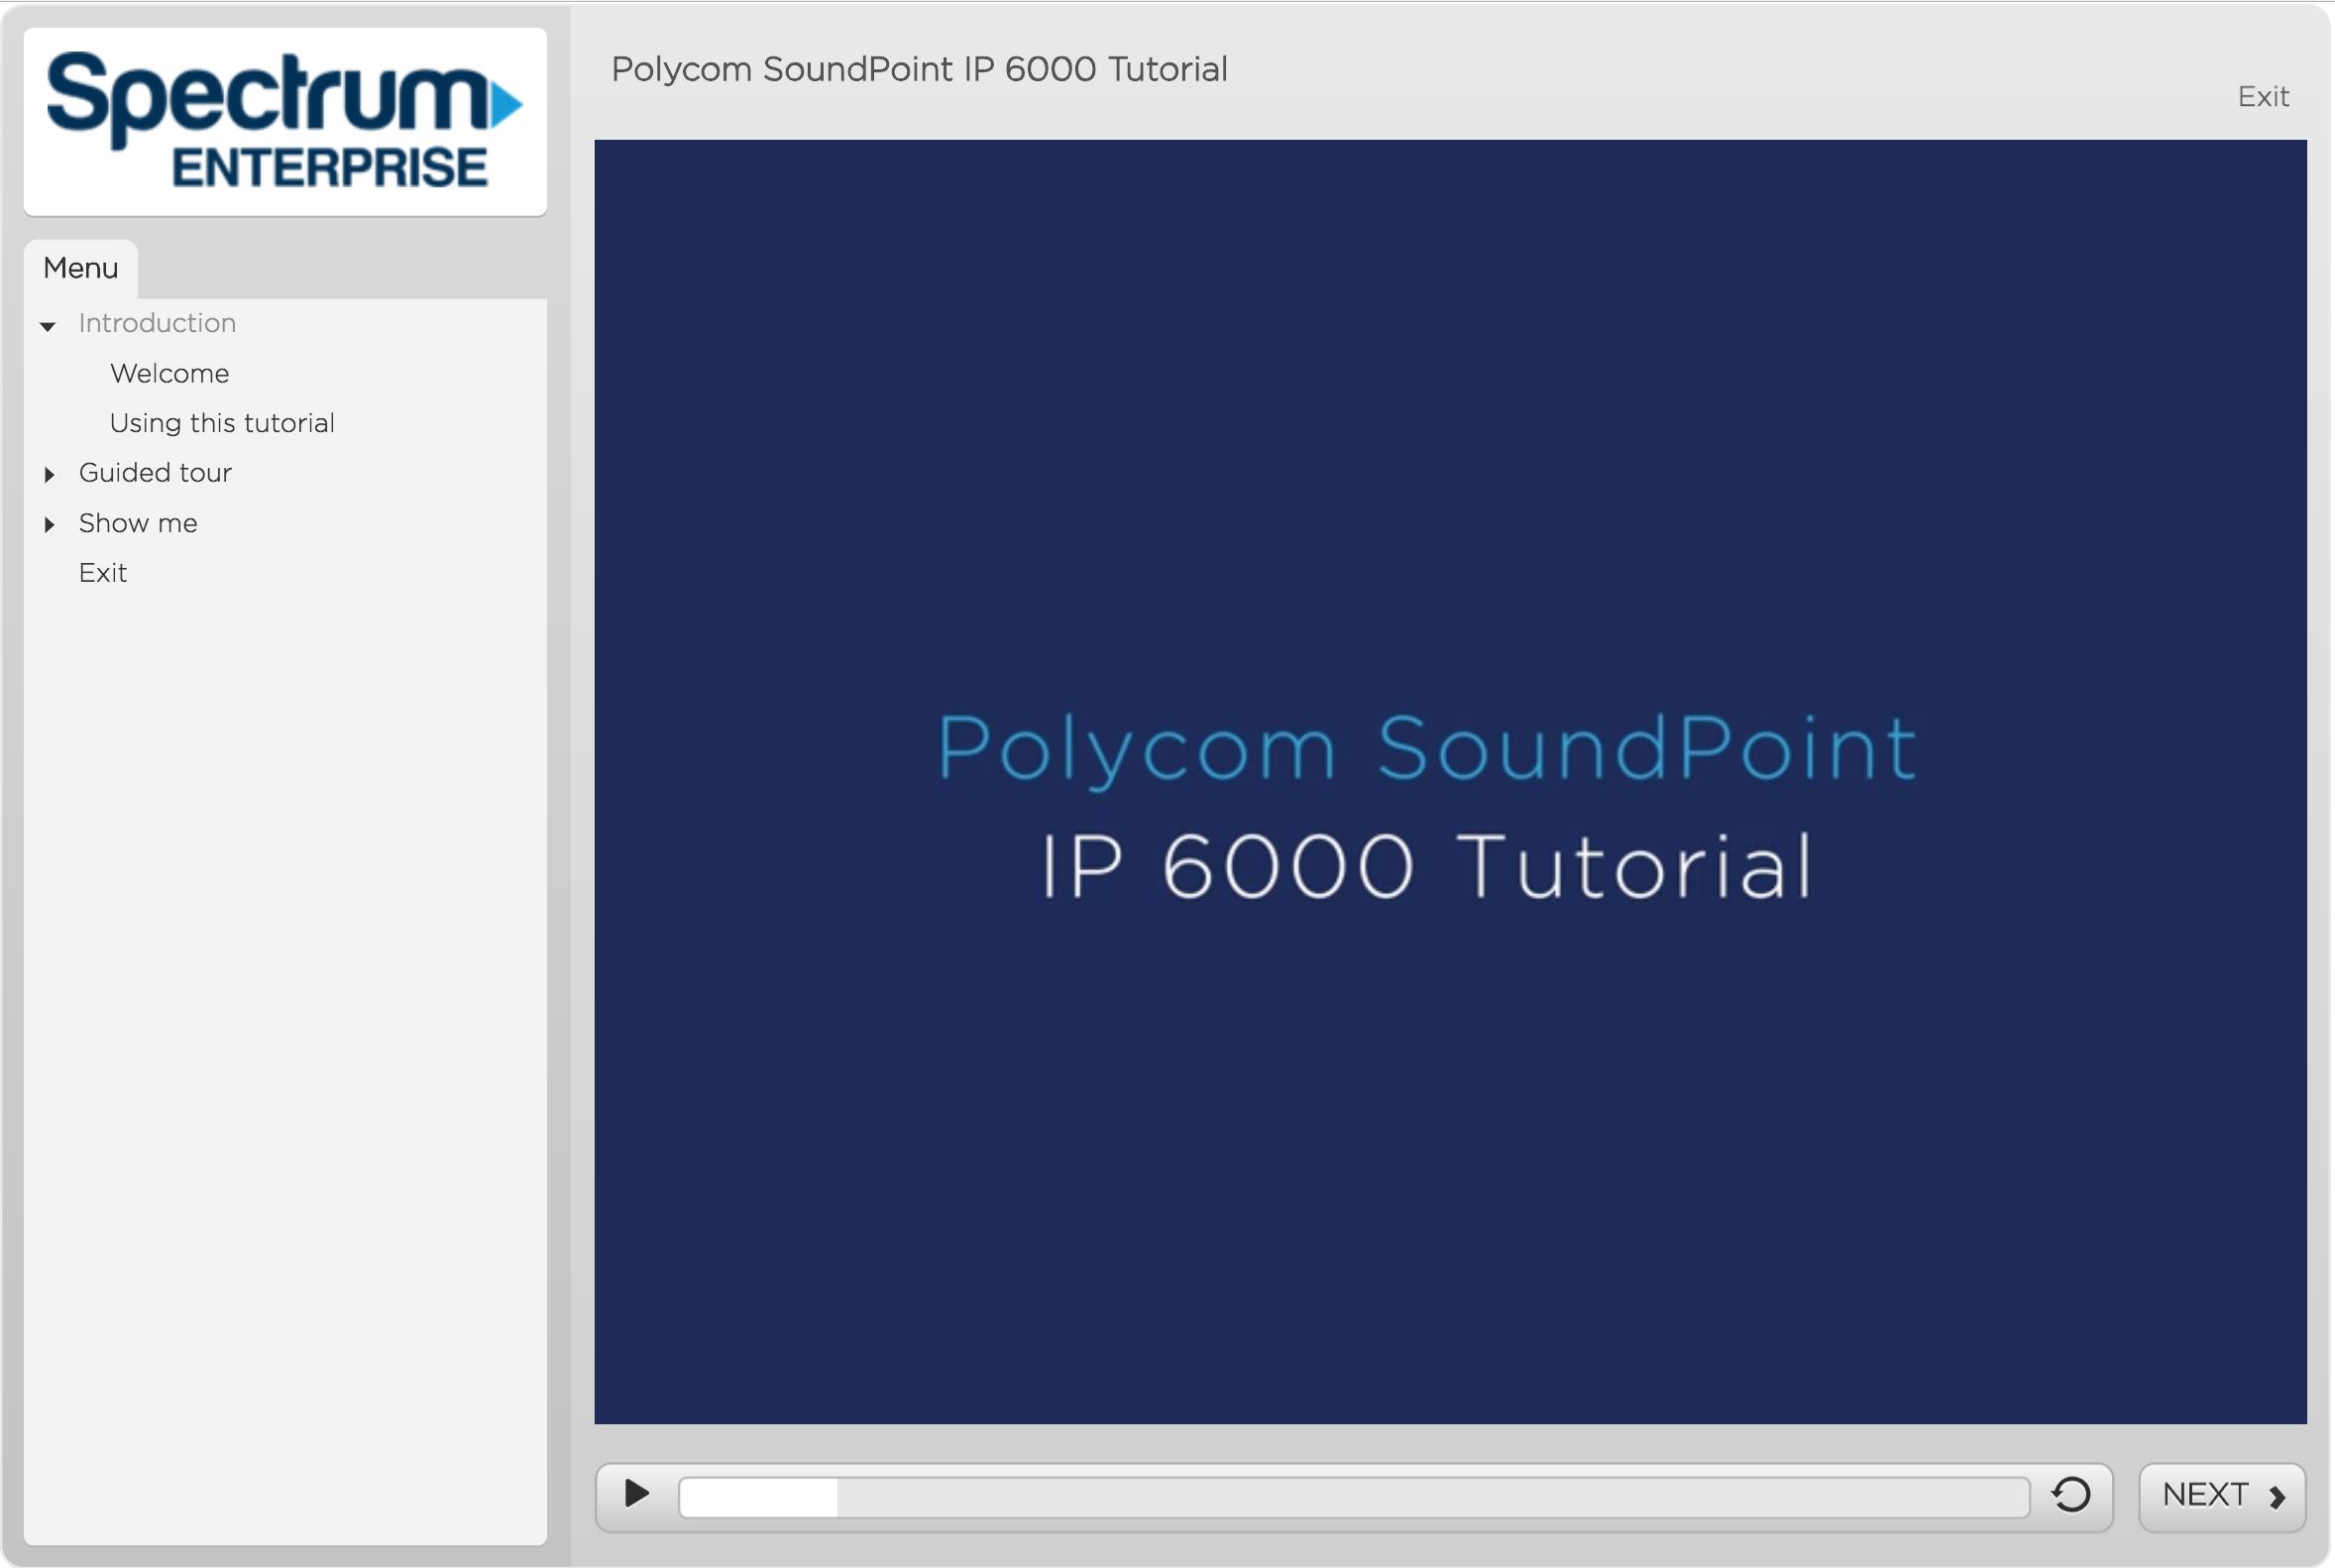 IP 6000 Tutorial